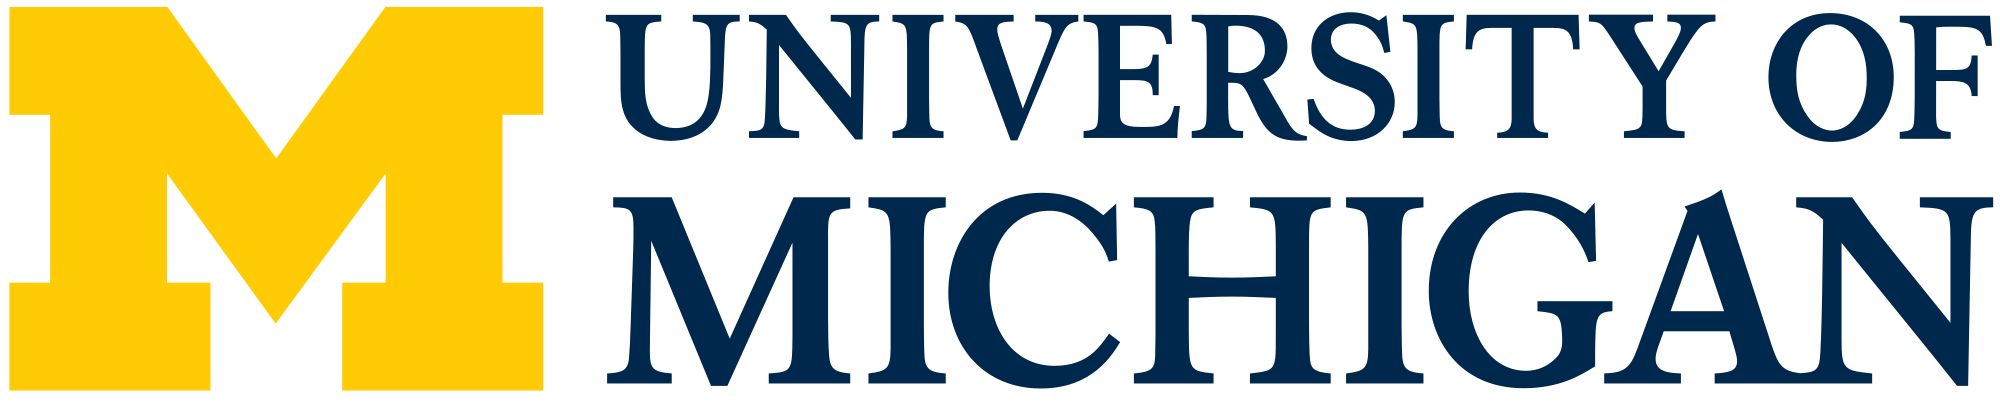 university_of_michigan_logo_png_1443119.png